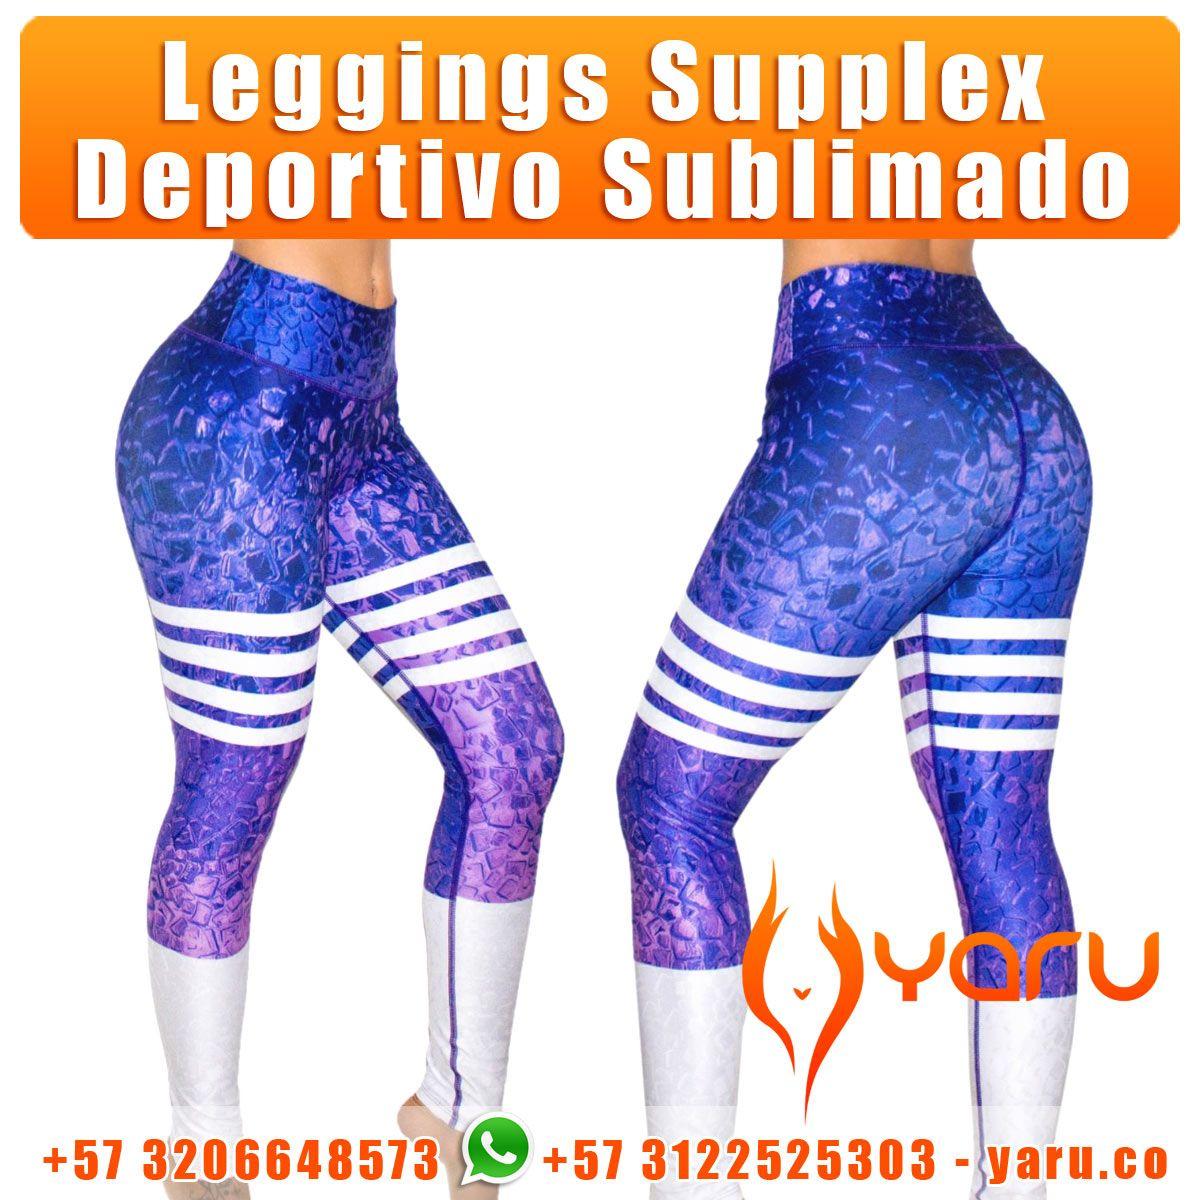 Leggins Deportivos Mallas Calzas Deportivas Leggins Deportivos Calzas Fajas Colombianas